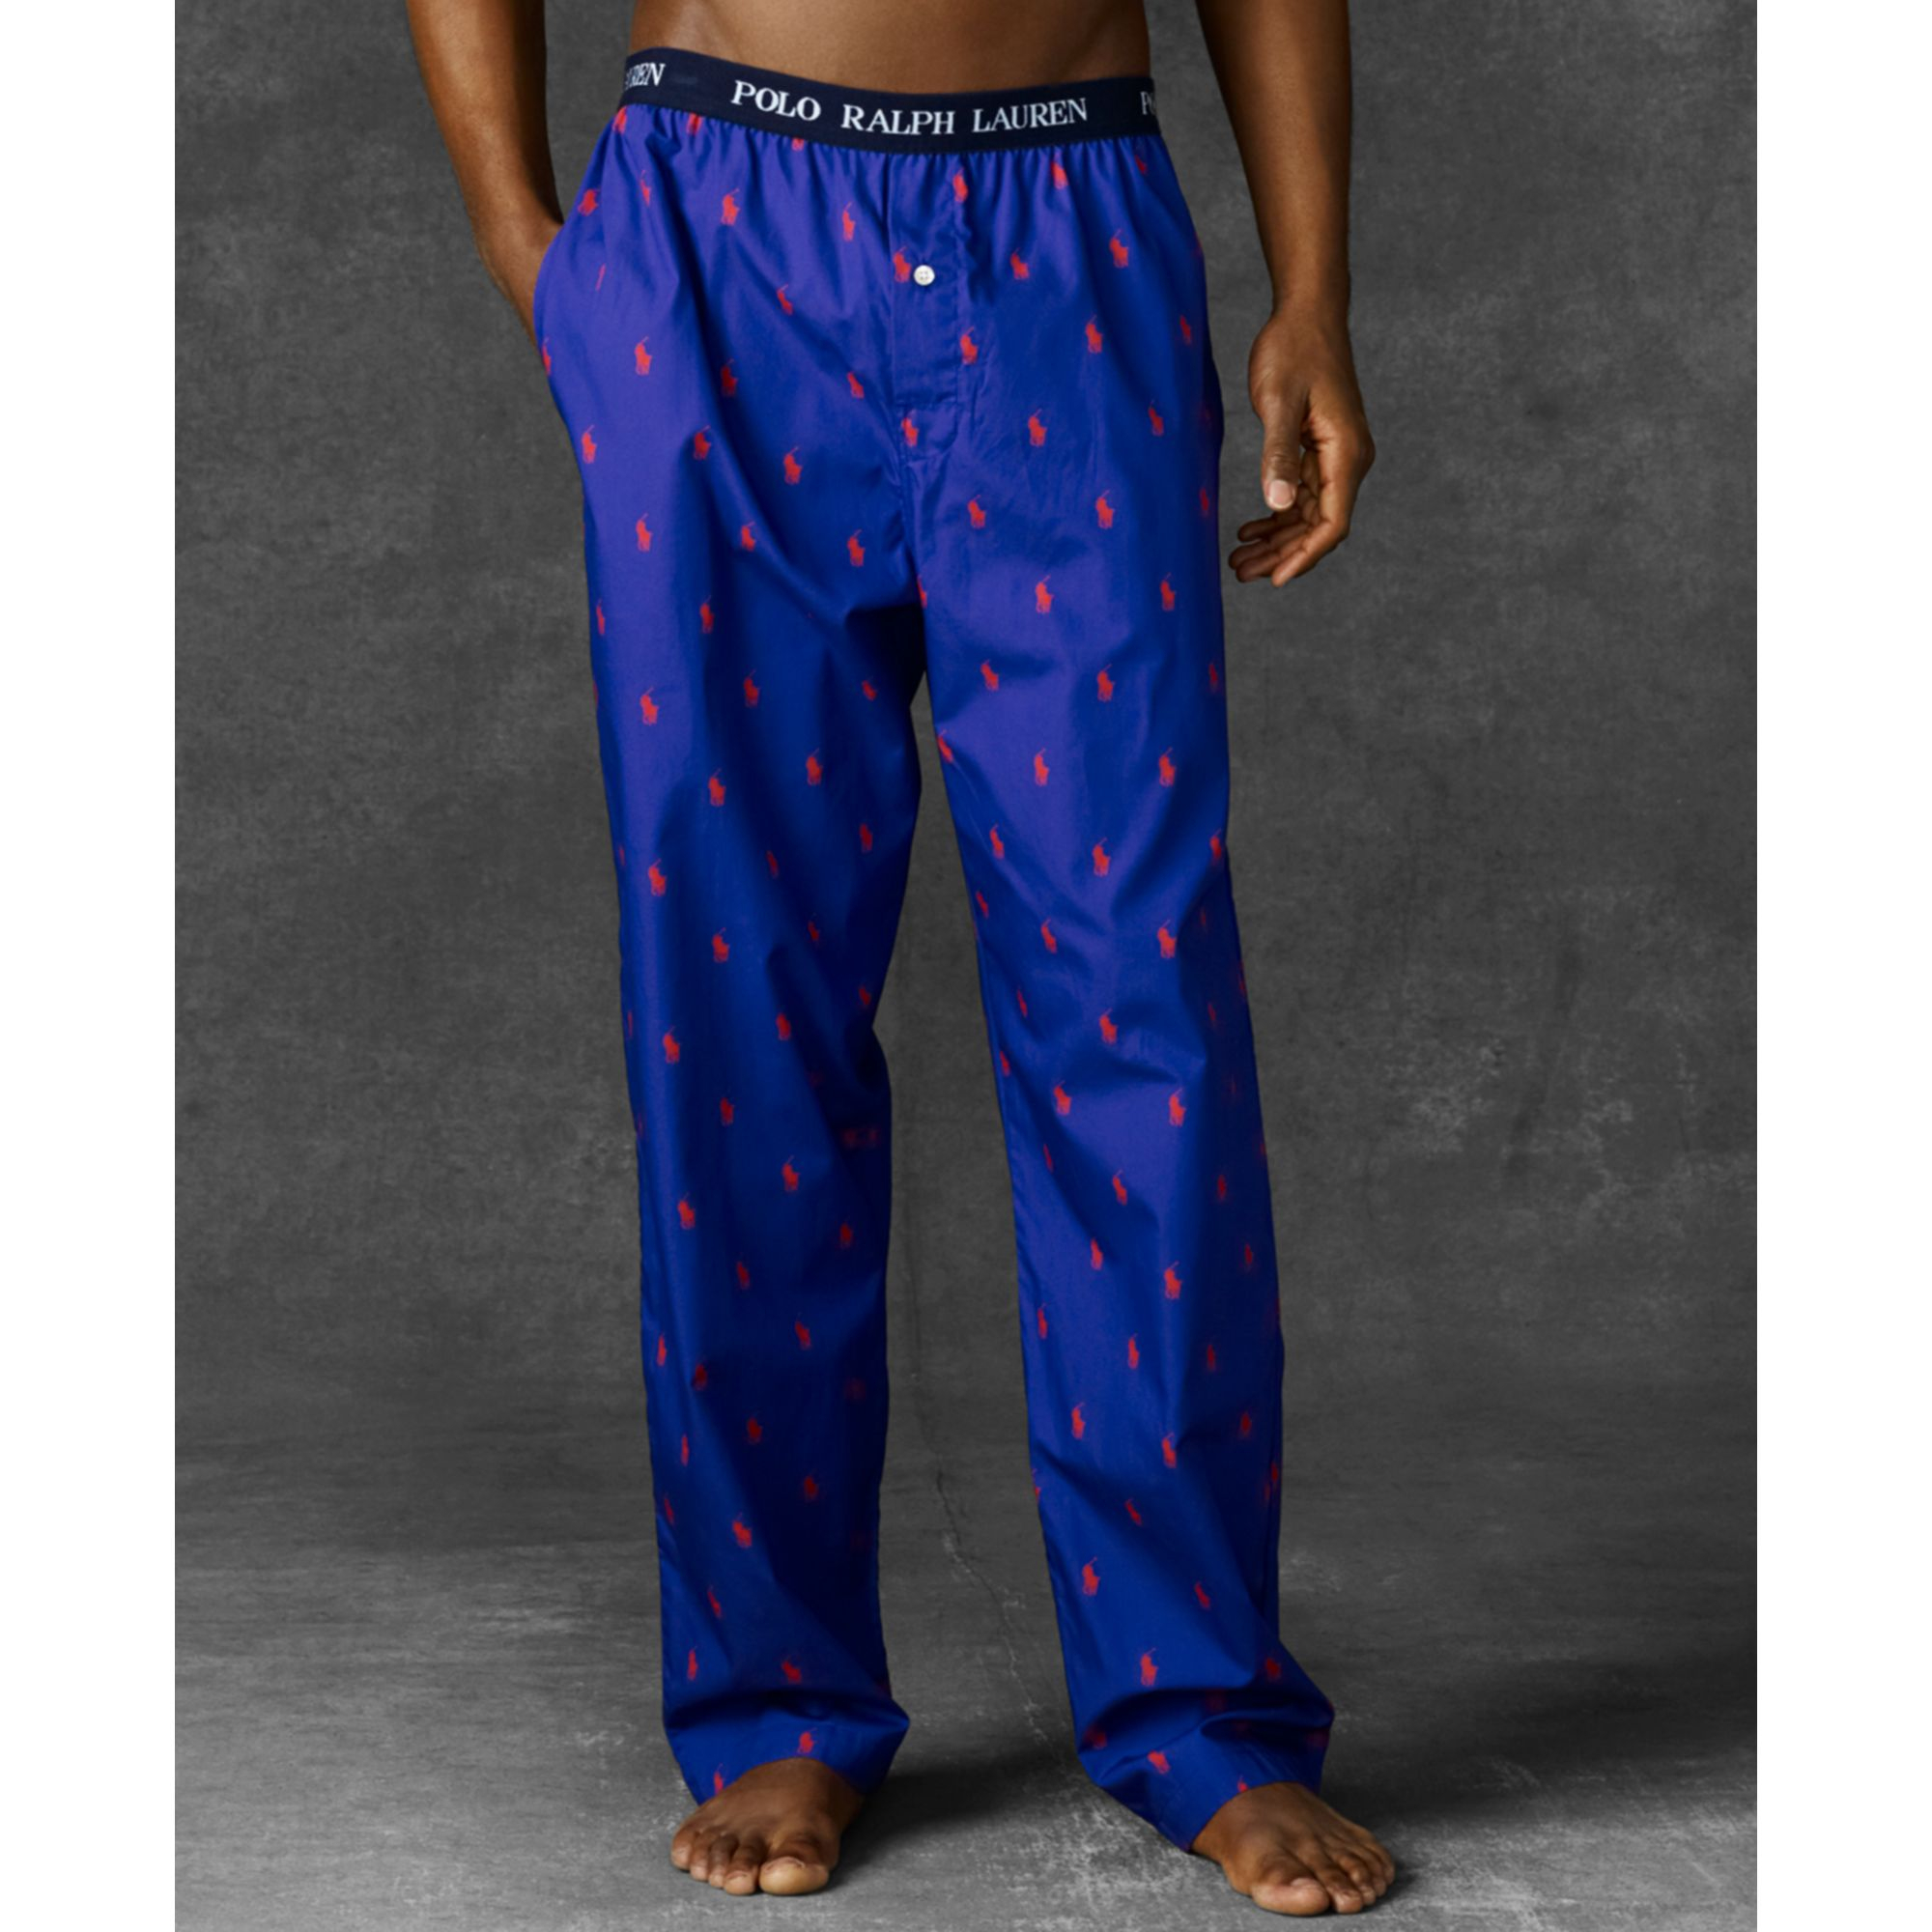 06e8a74be8 Polo Ralph Lauren Mens Knit Oxford Pajama Pants